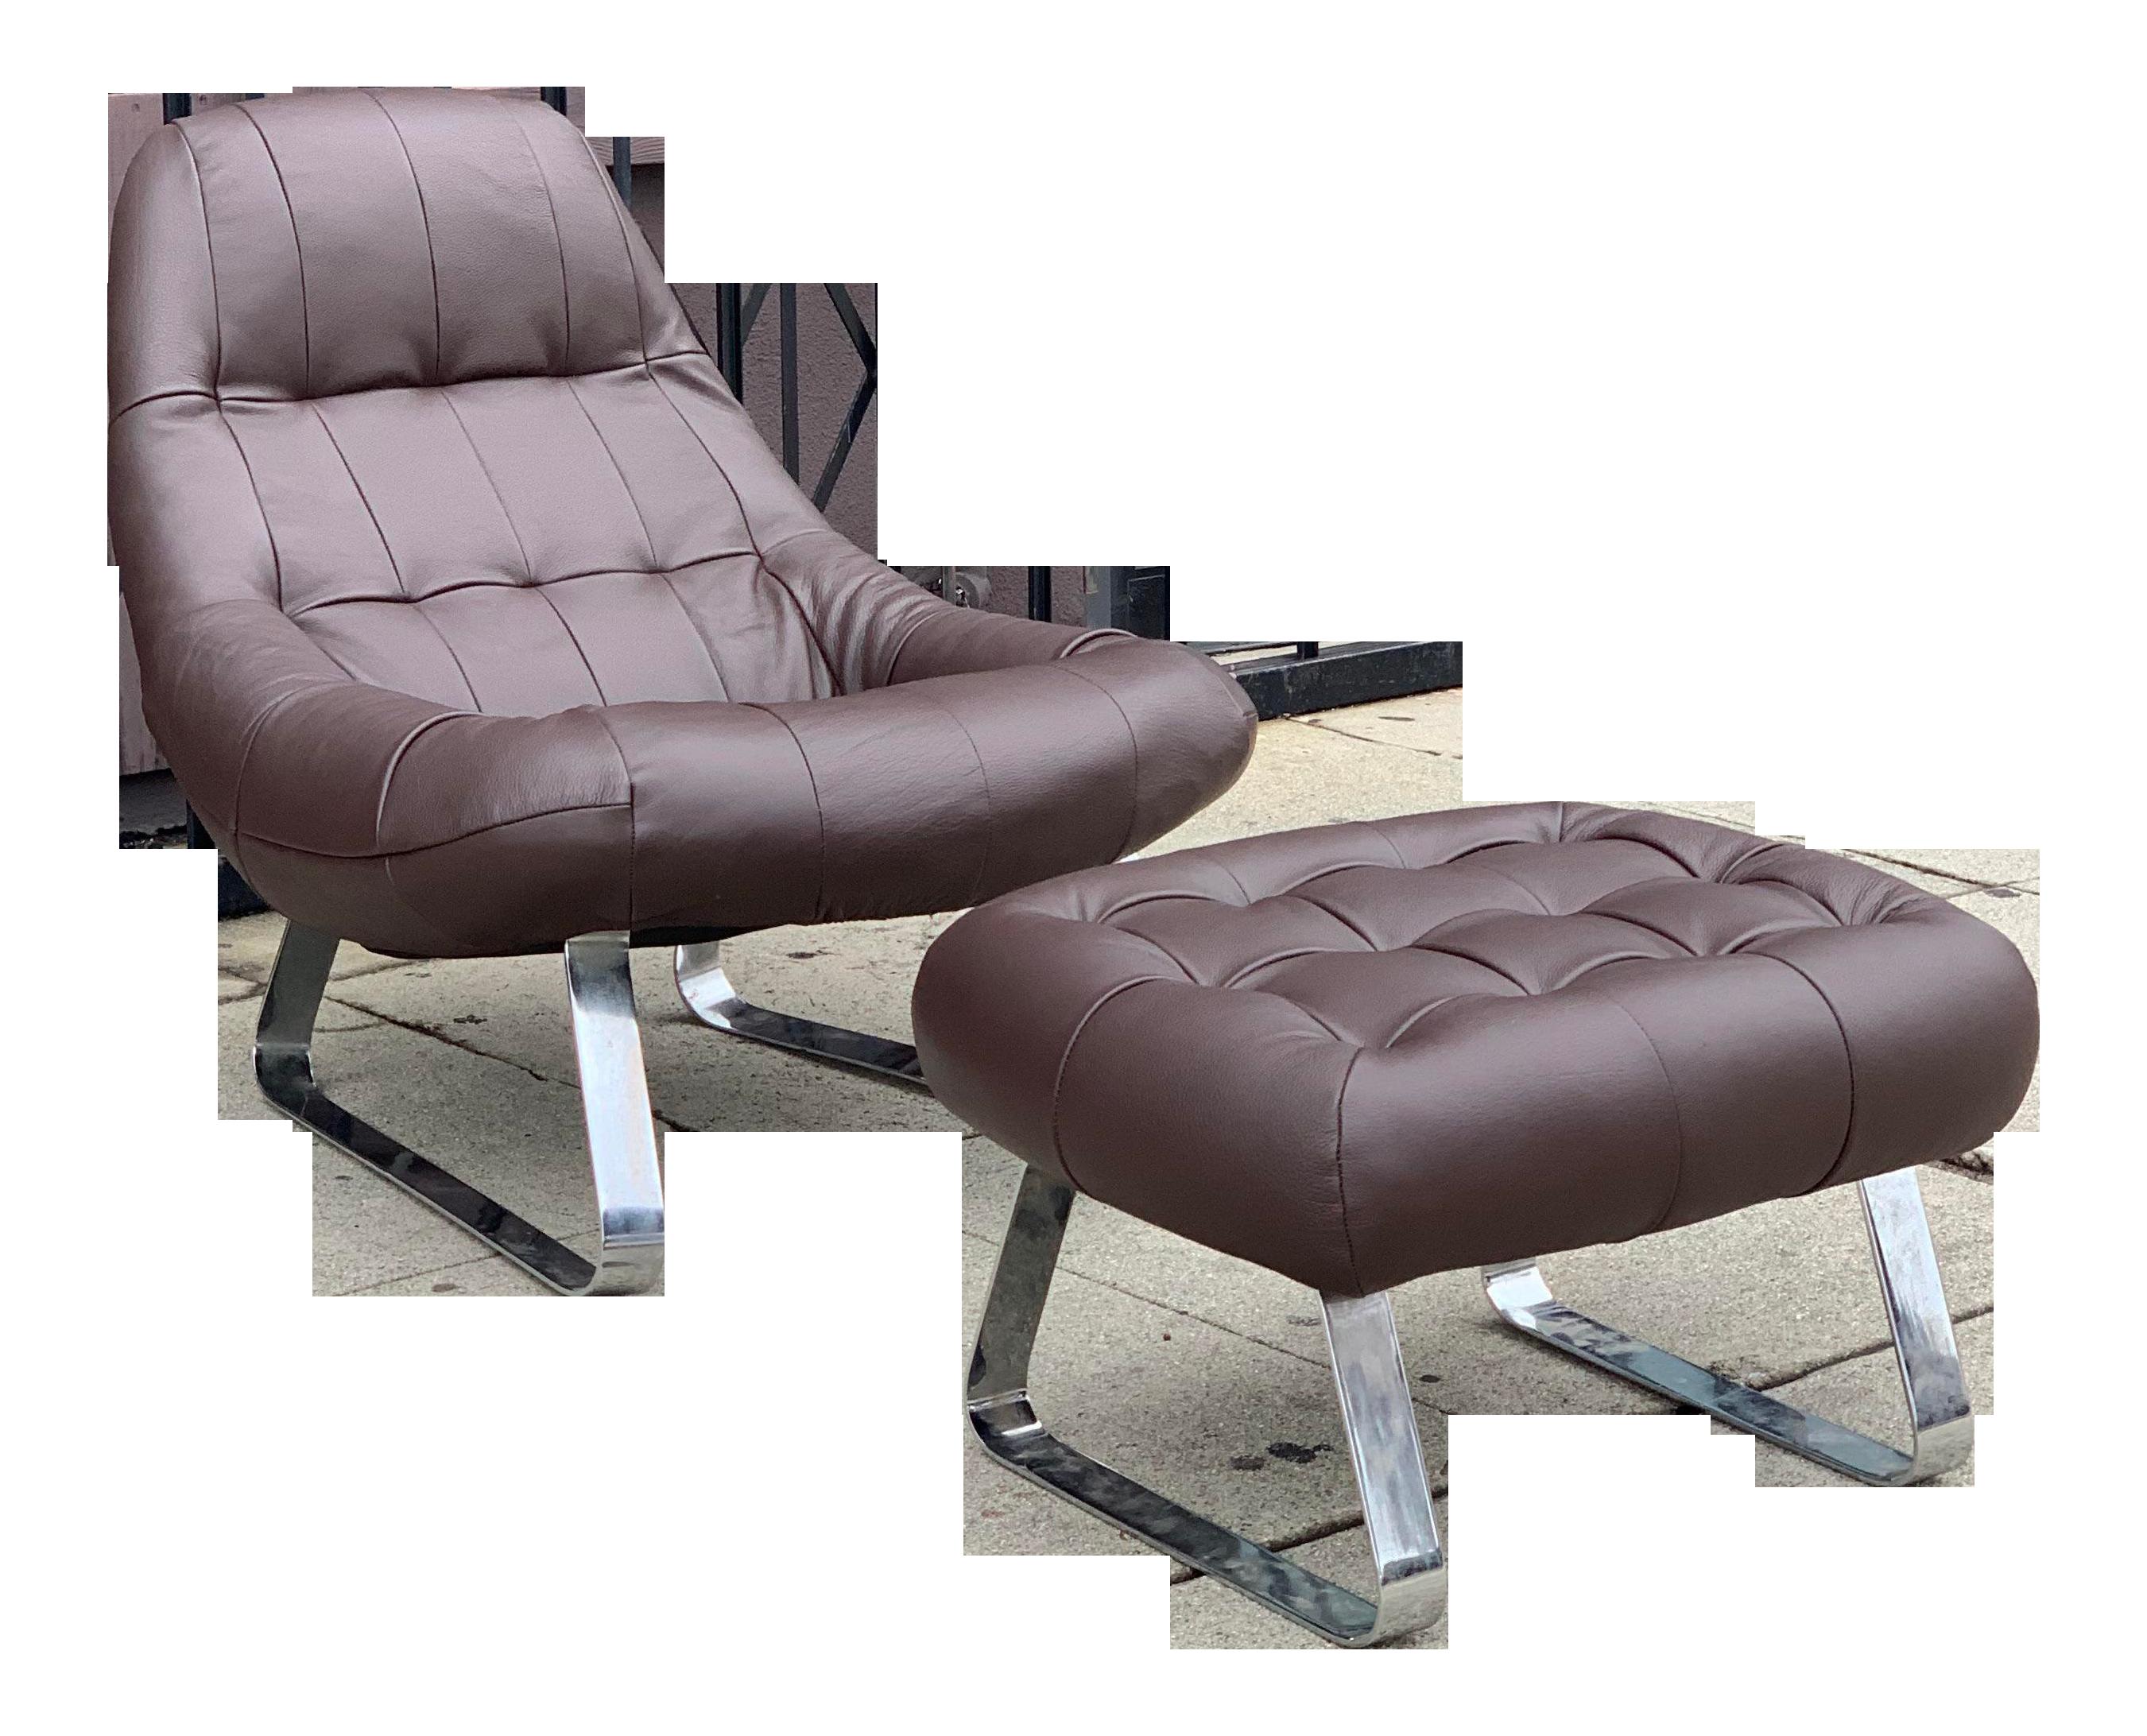 Etonnant Mid Century Modern Percival Lafer Brazilian Lounge Chair And Ottoman |  Chairish